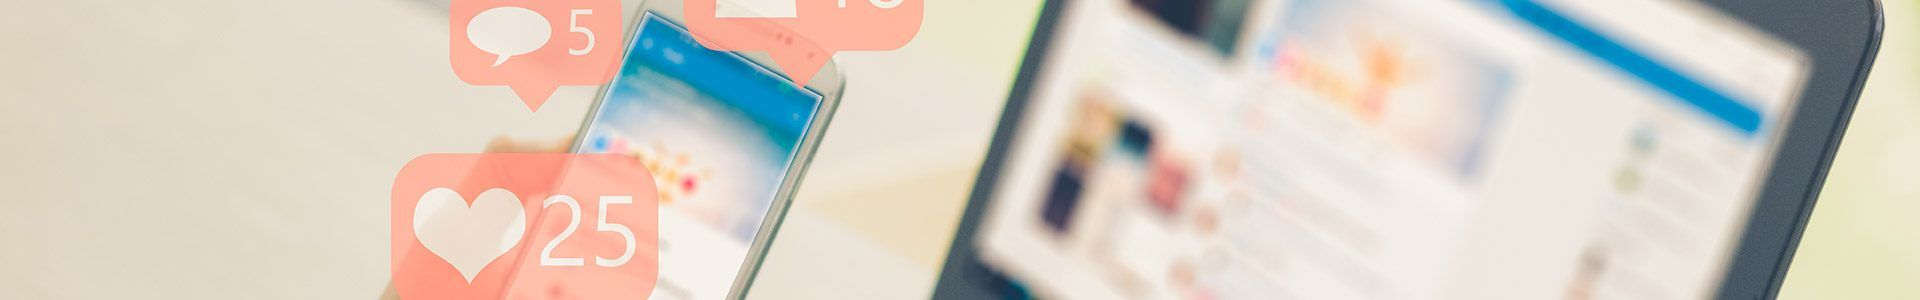 ING, Kruidvat en Media Markt meestal besproken consumentenmerken op social media in november